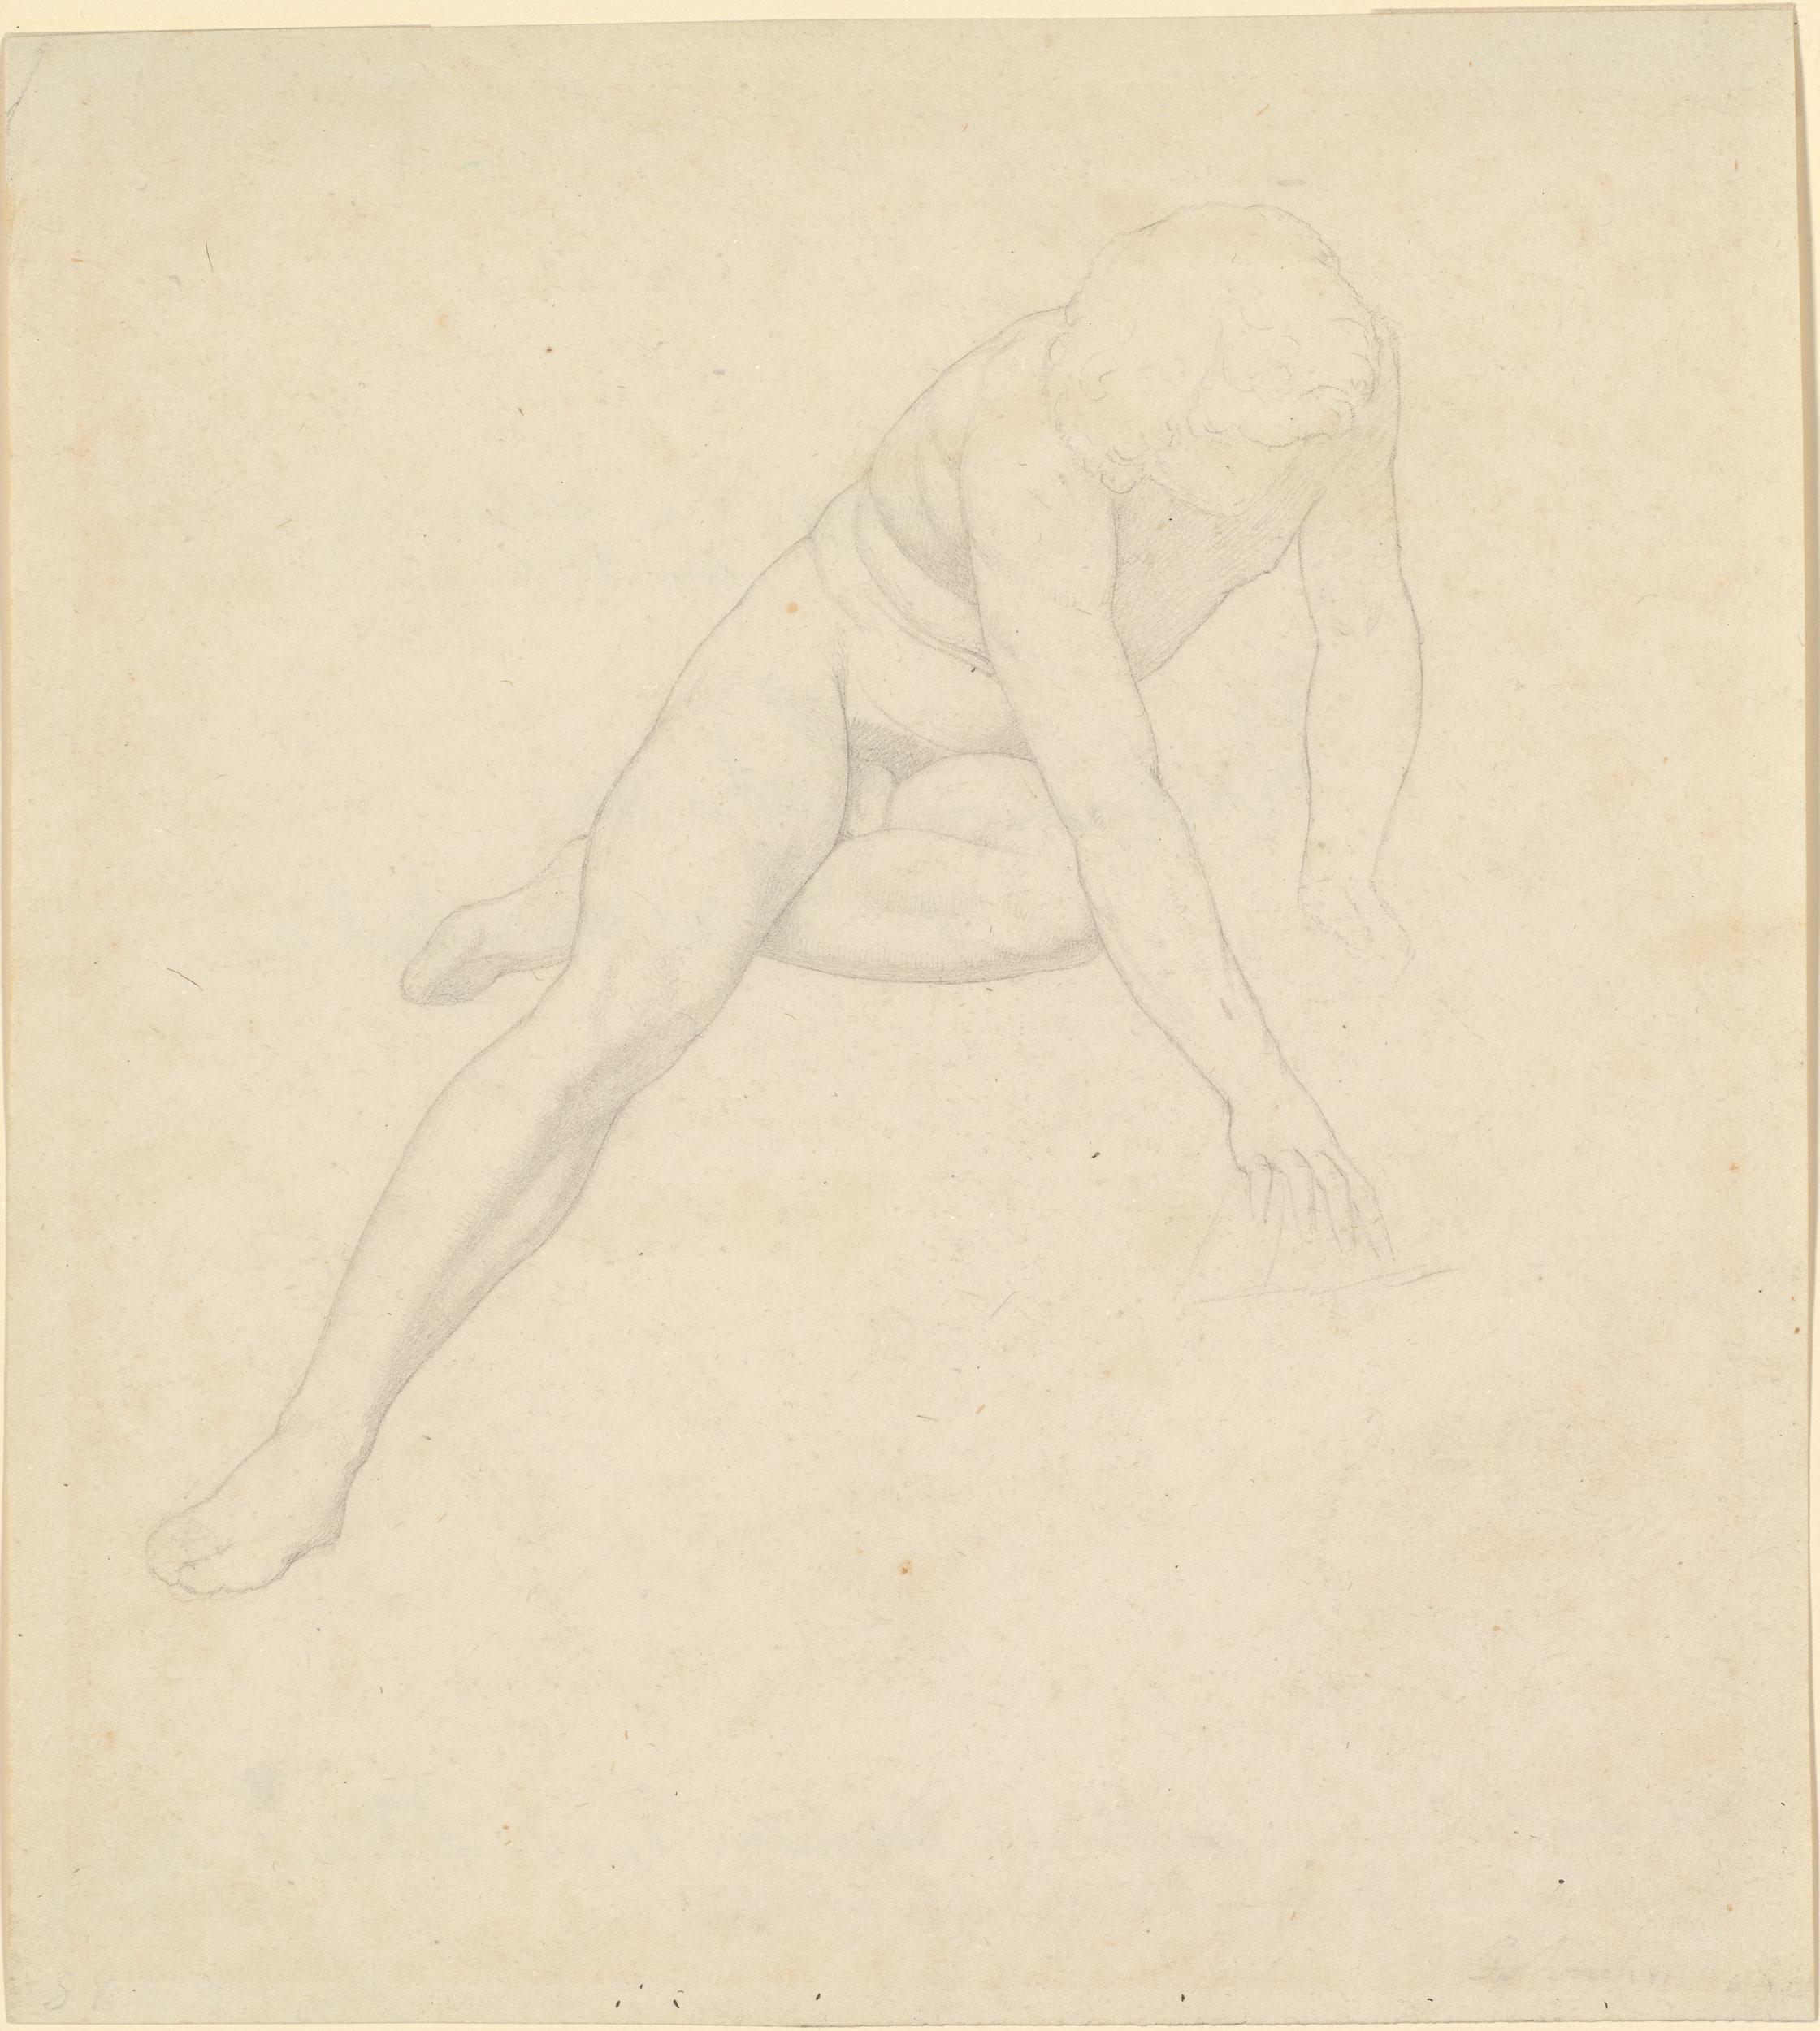 Julius Schnorr Von Carolsfeld Drawings 298015v_0001.jpg